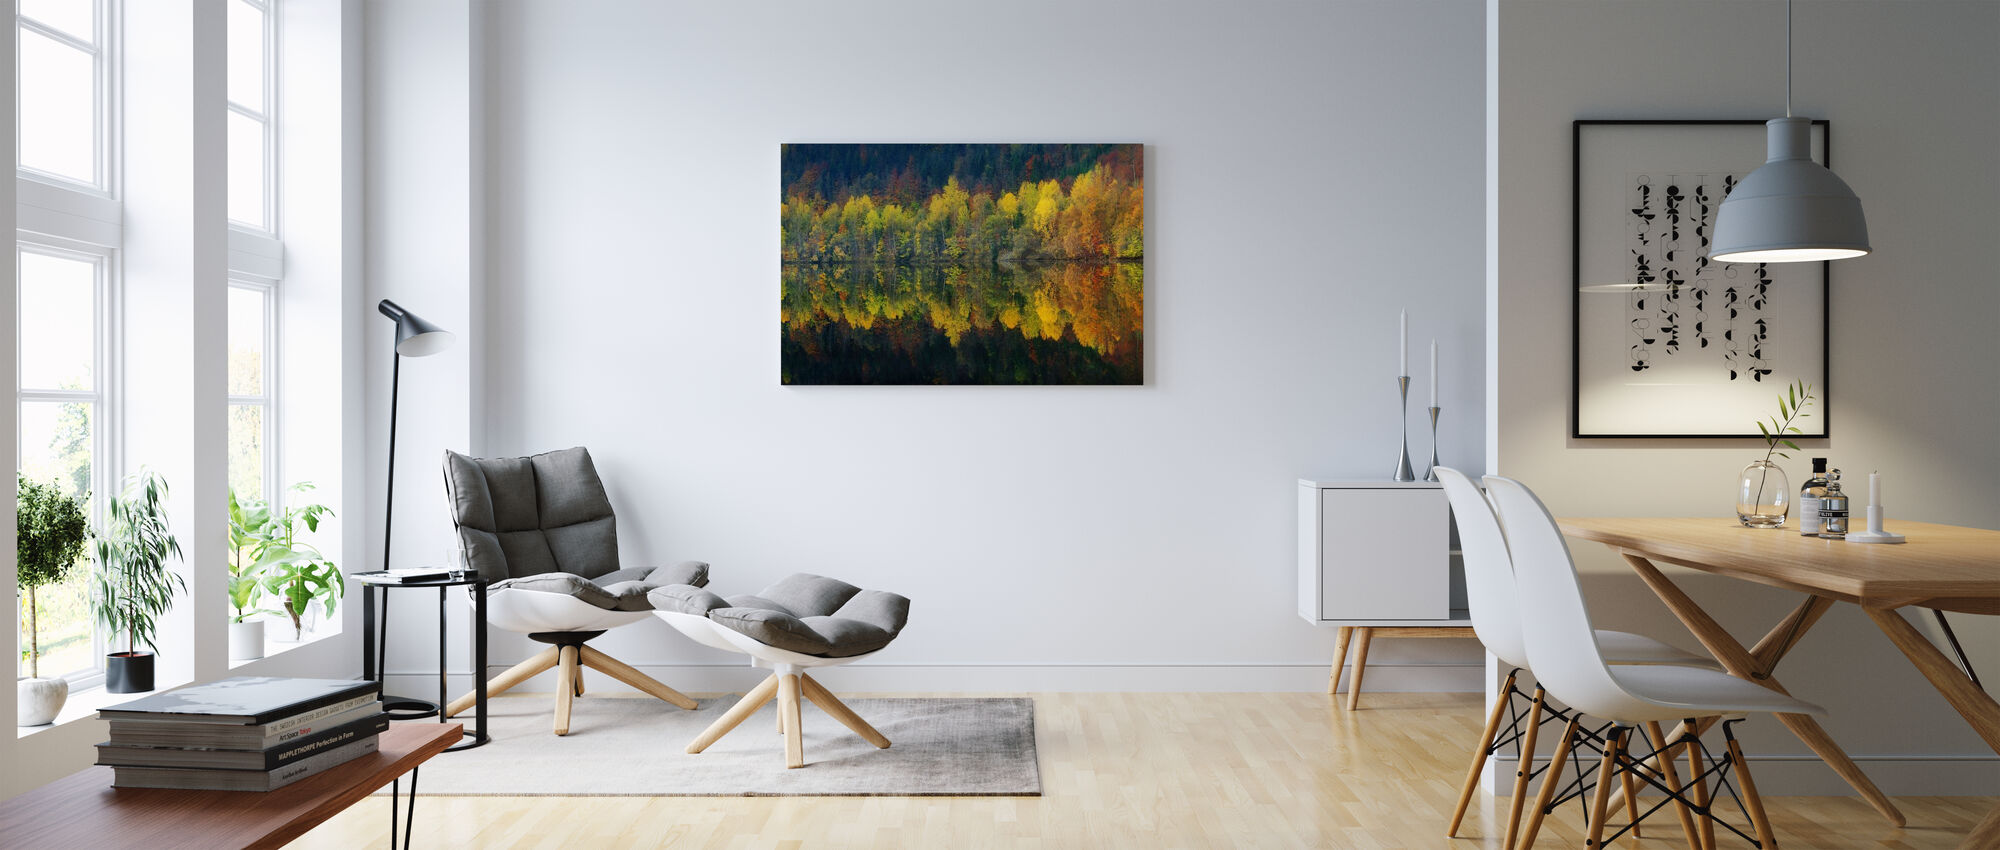 Höstens tystnad - Canvastavla - Vardagsrum